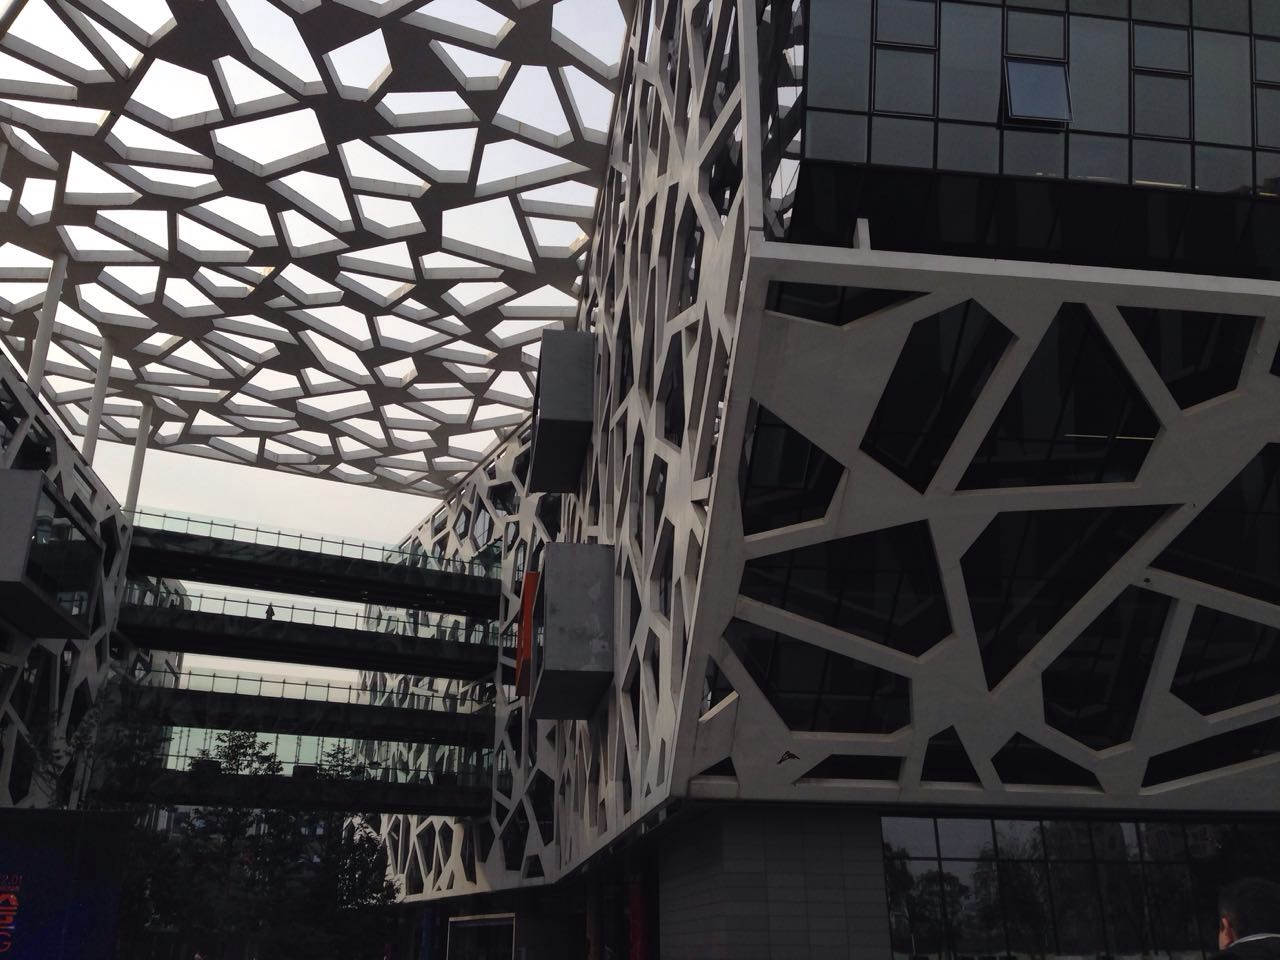 visite du campus d 39 alibaba le plus moderne de chine marketing chine. Black Bedroom Furniture Sets. Home Design Ideas